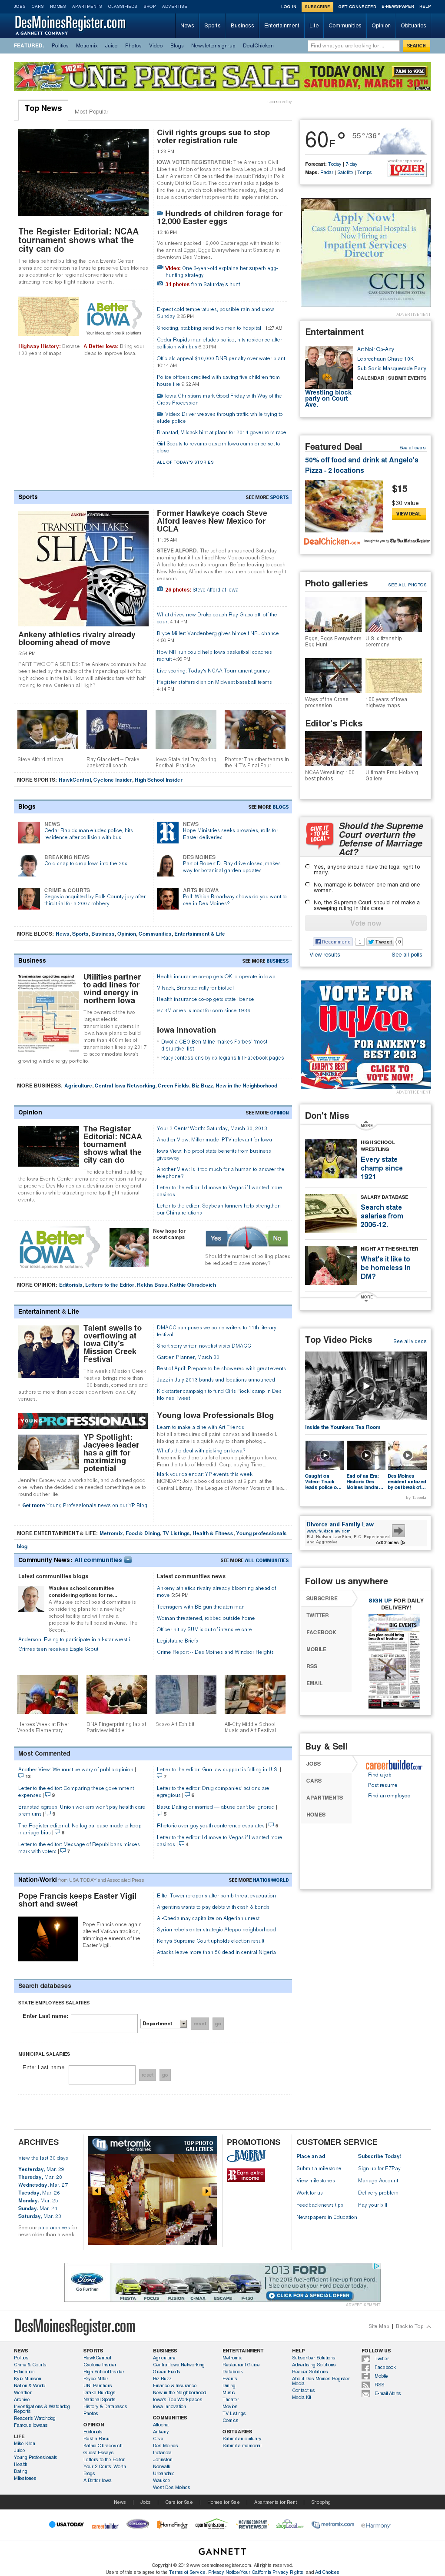 DesMoinesRegister.com at Sunday March 31, 2013, 12:04 a.m. UTC